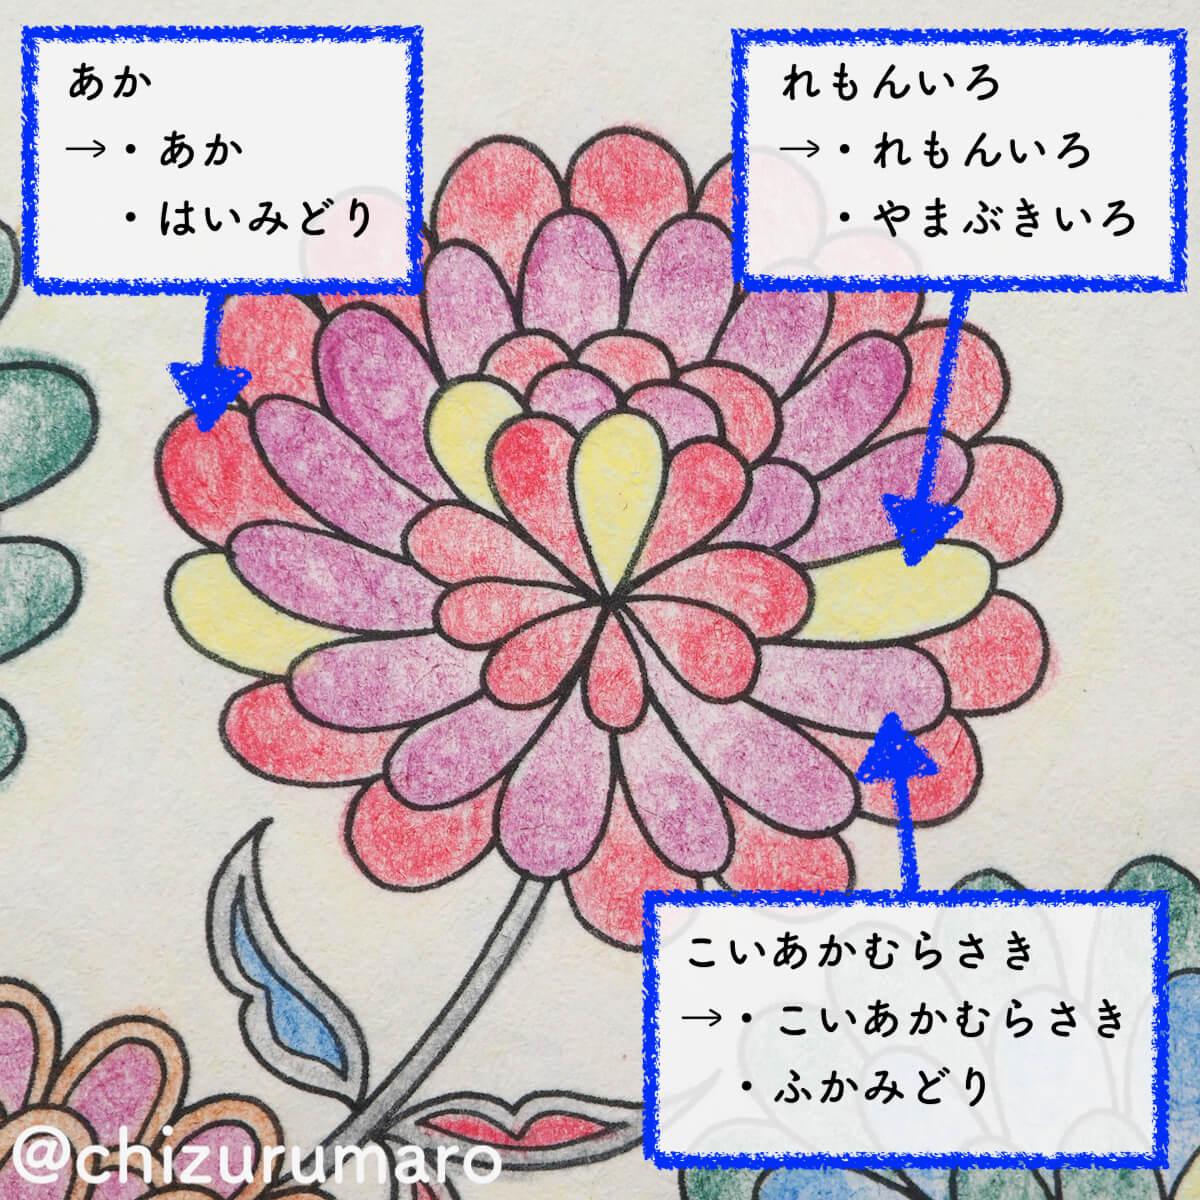 f:id:chizurumaro:20200326113505j:plain